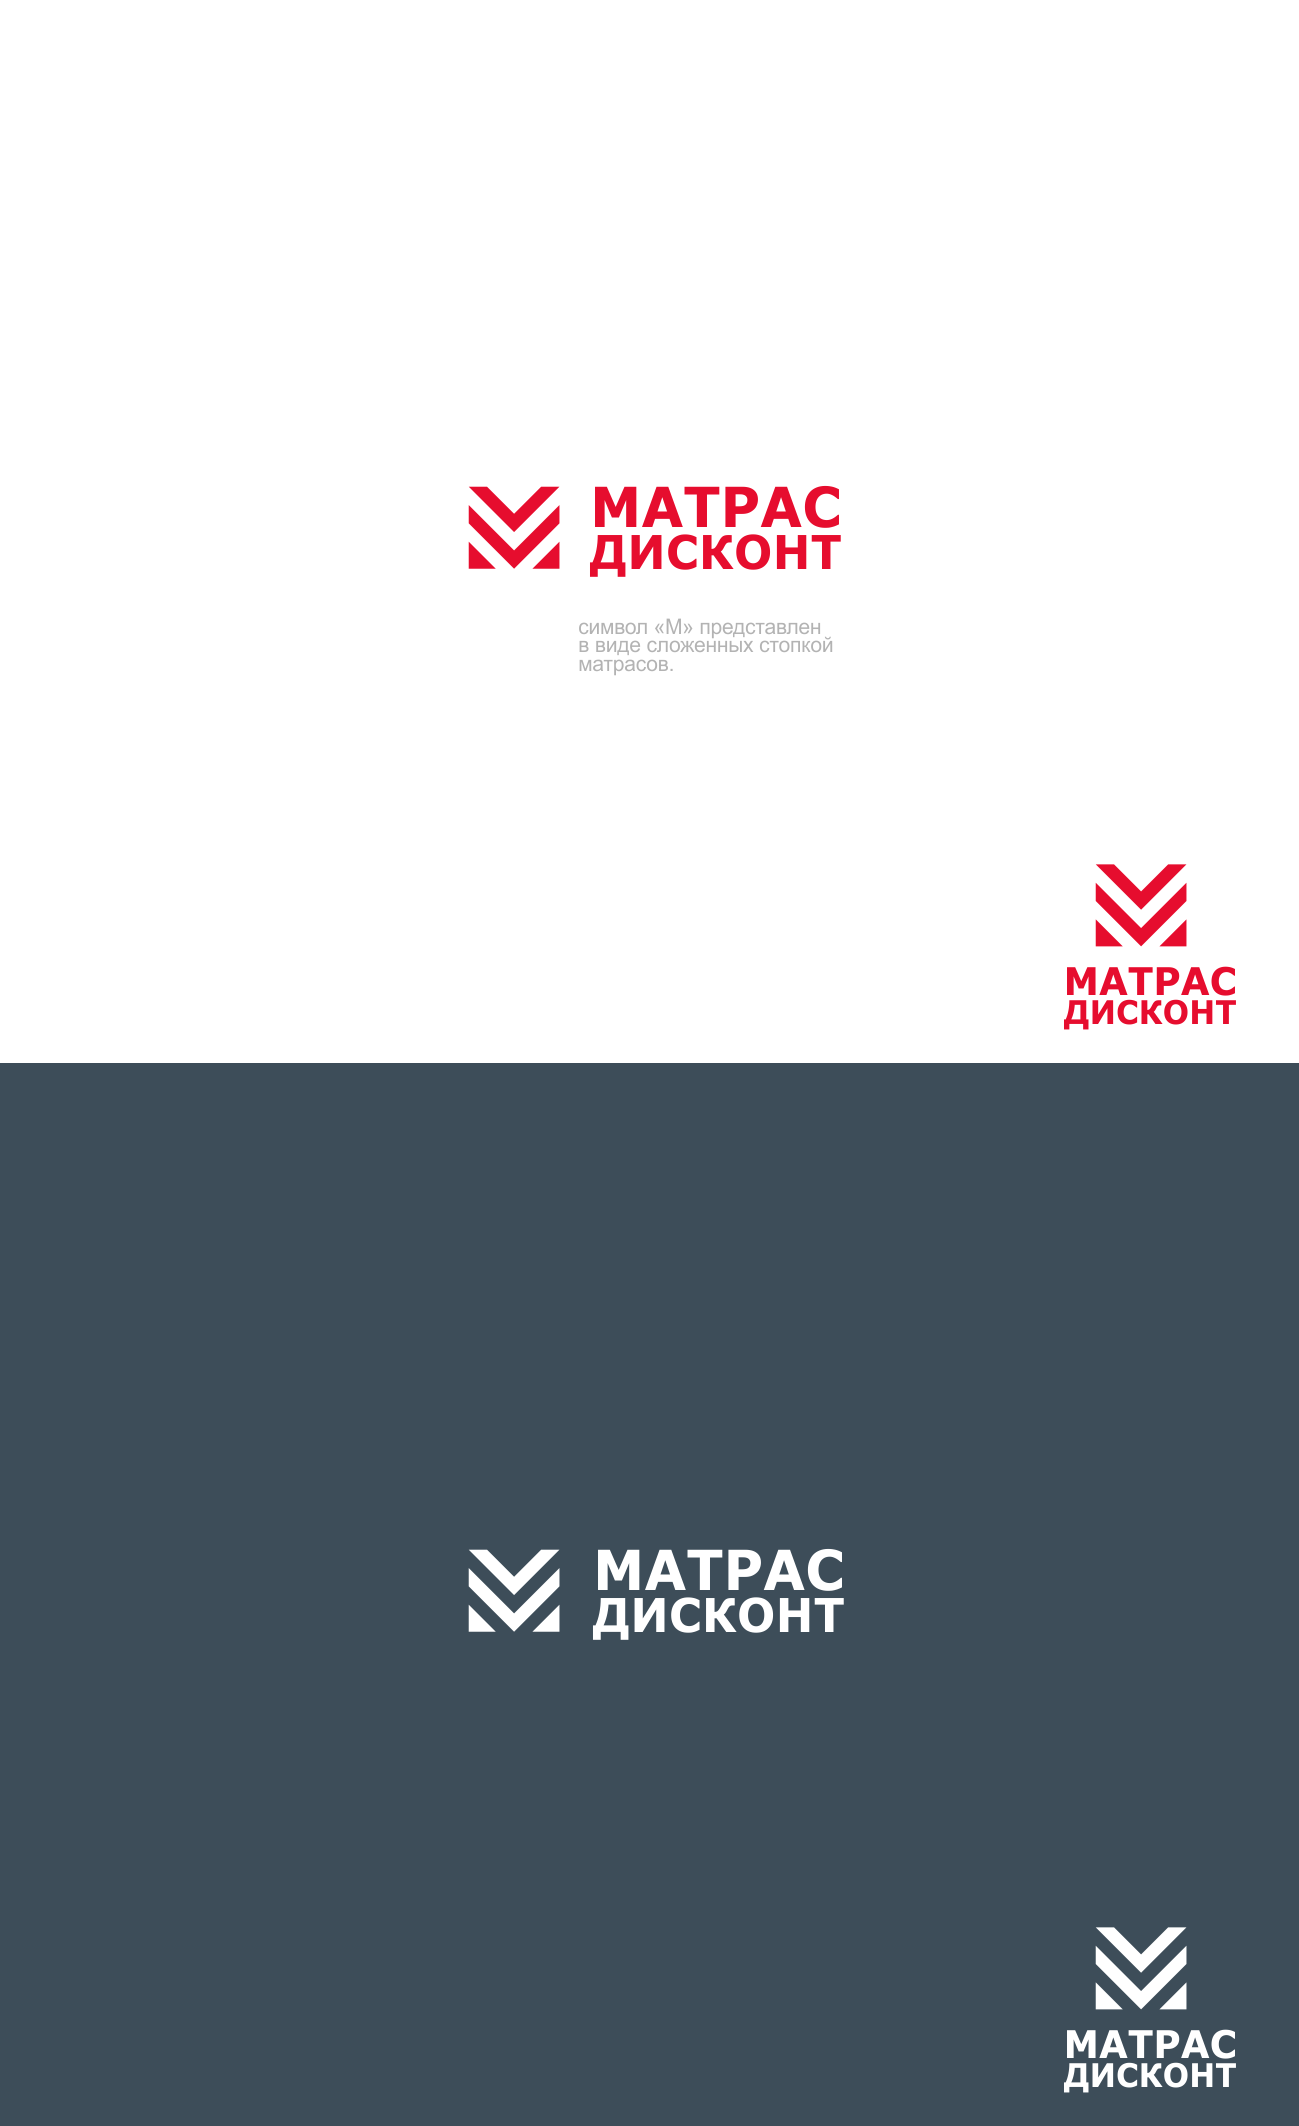 Логотип для ИМ матрасов фото f_6995c917ffc76bf0.png